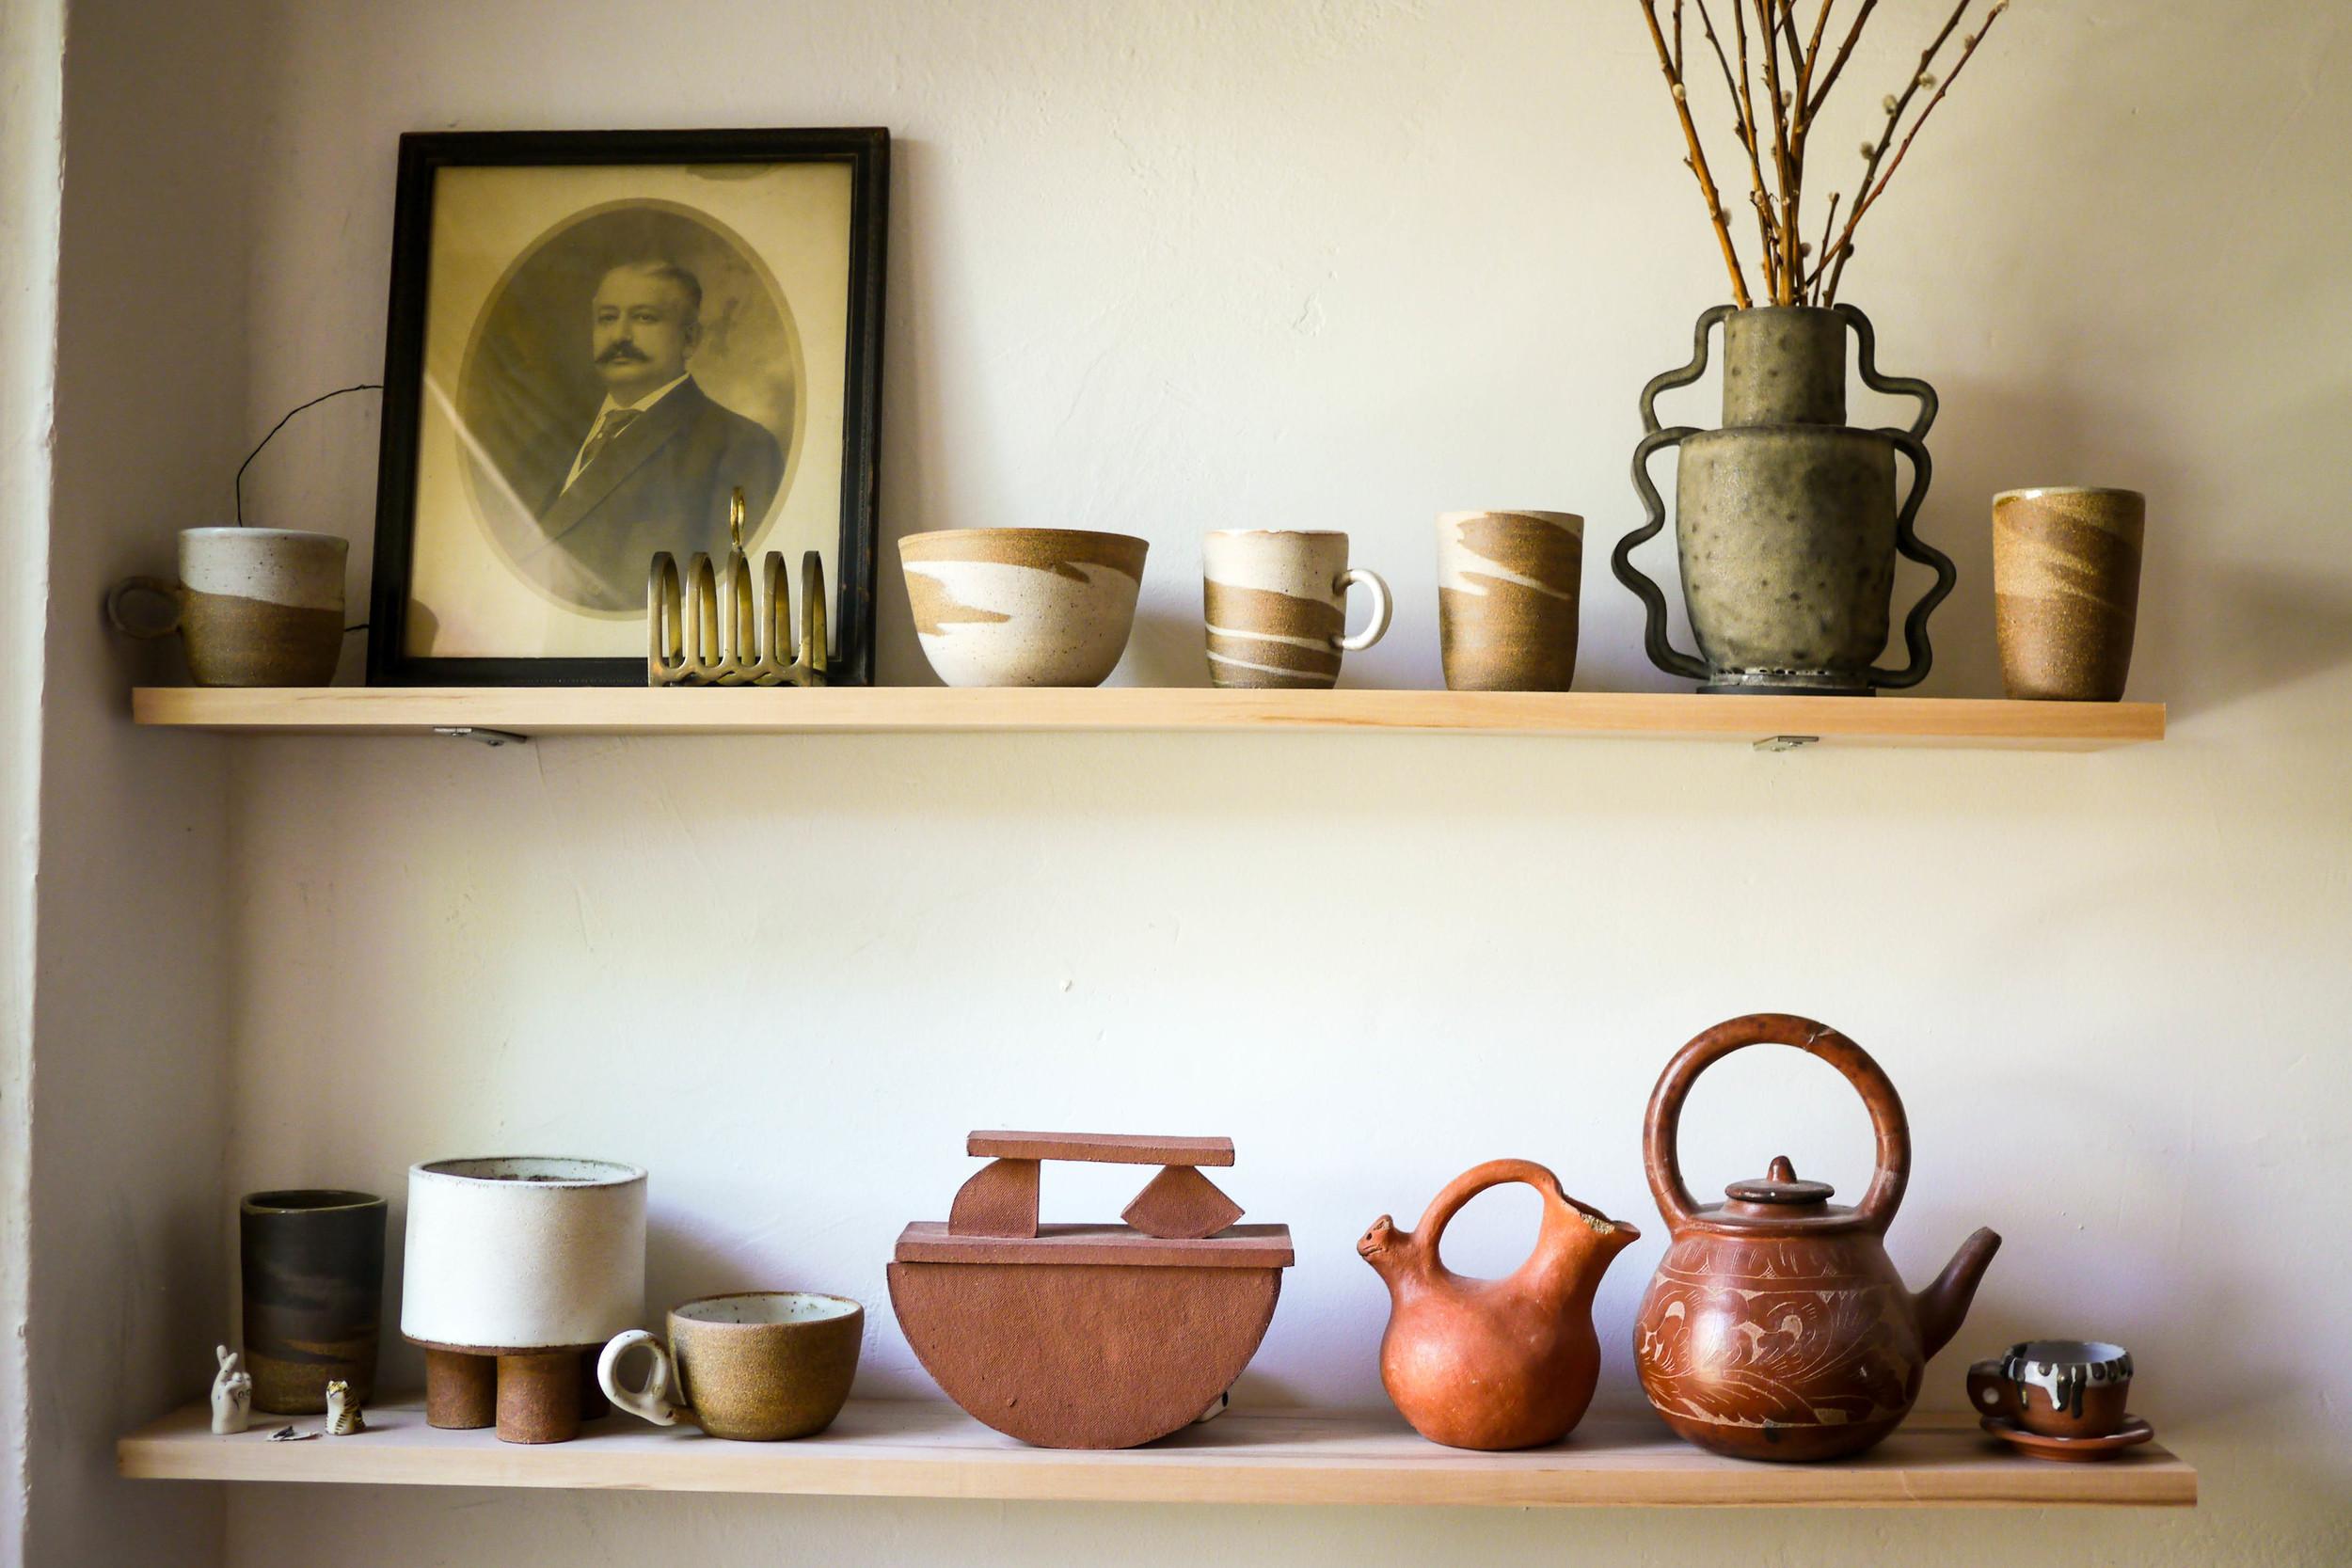 Helen Levi's ceramics